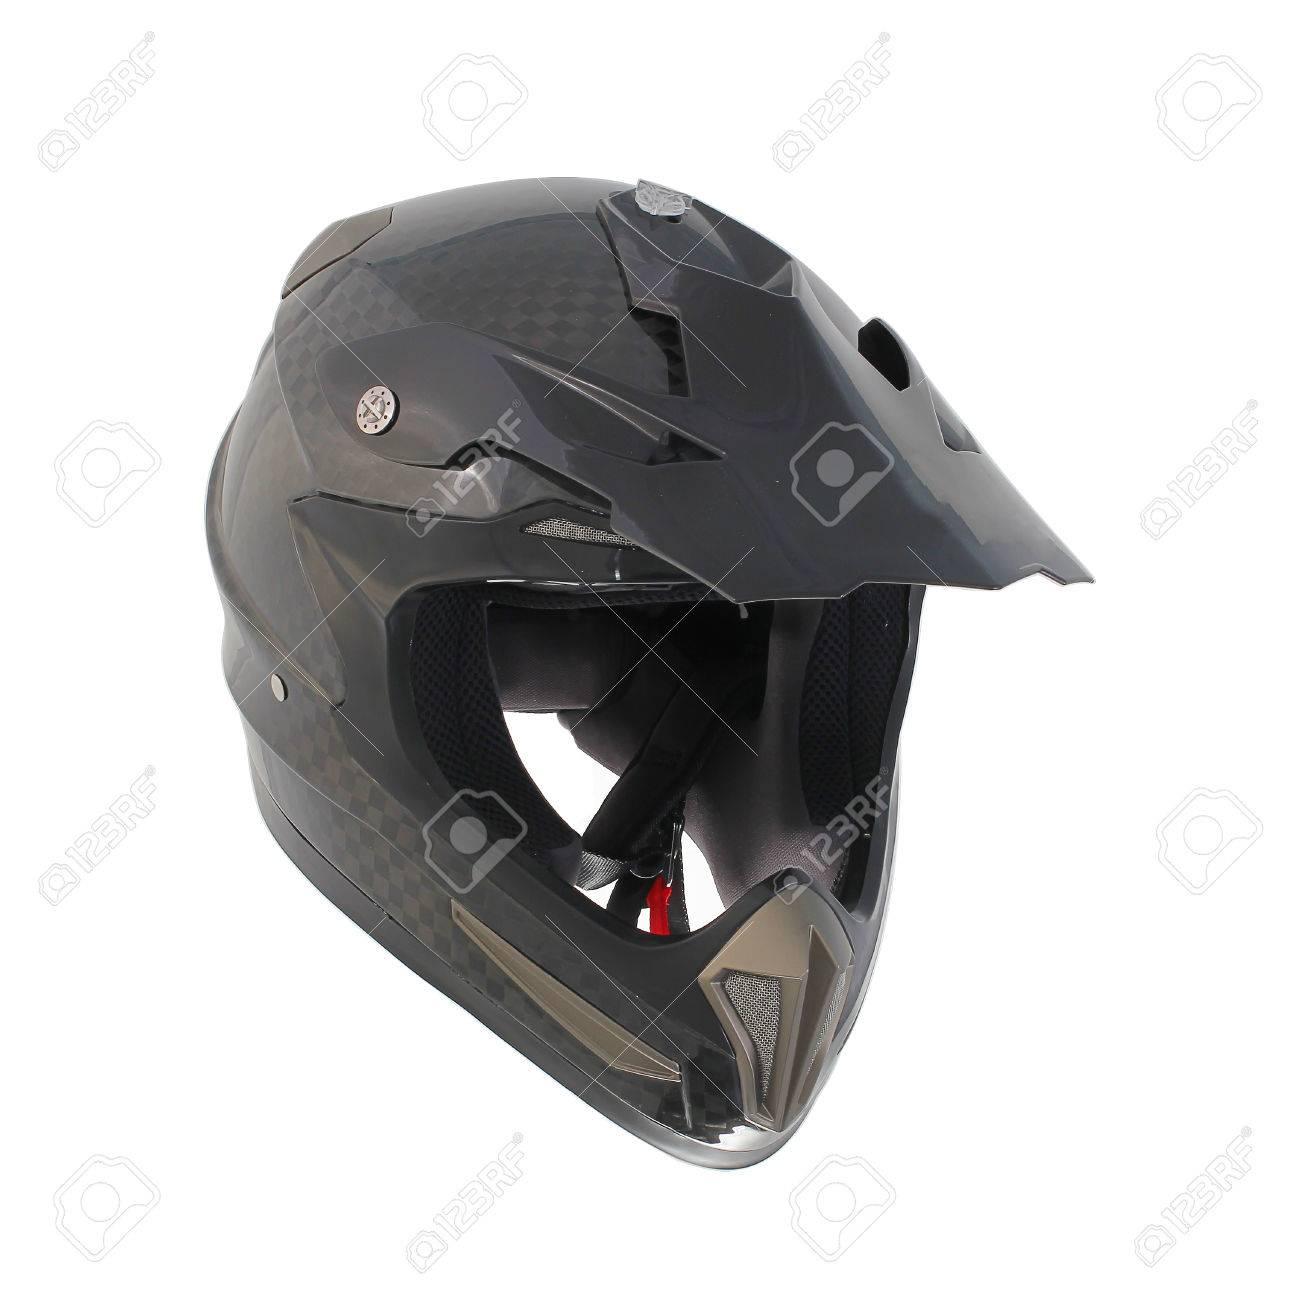 Carbon Fiber Motorcycle Helmets >> Motocross Motorcycle Helmet Isolated On White Background Black